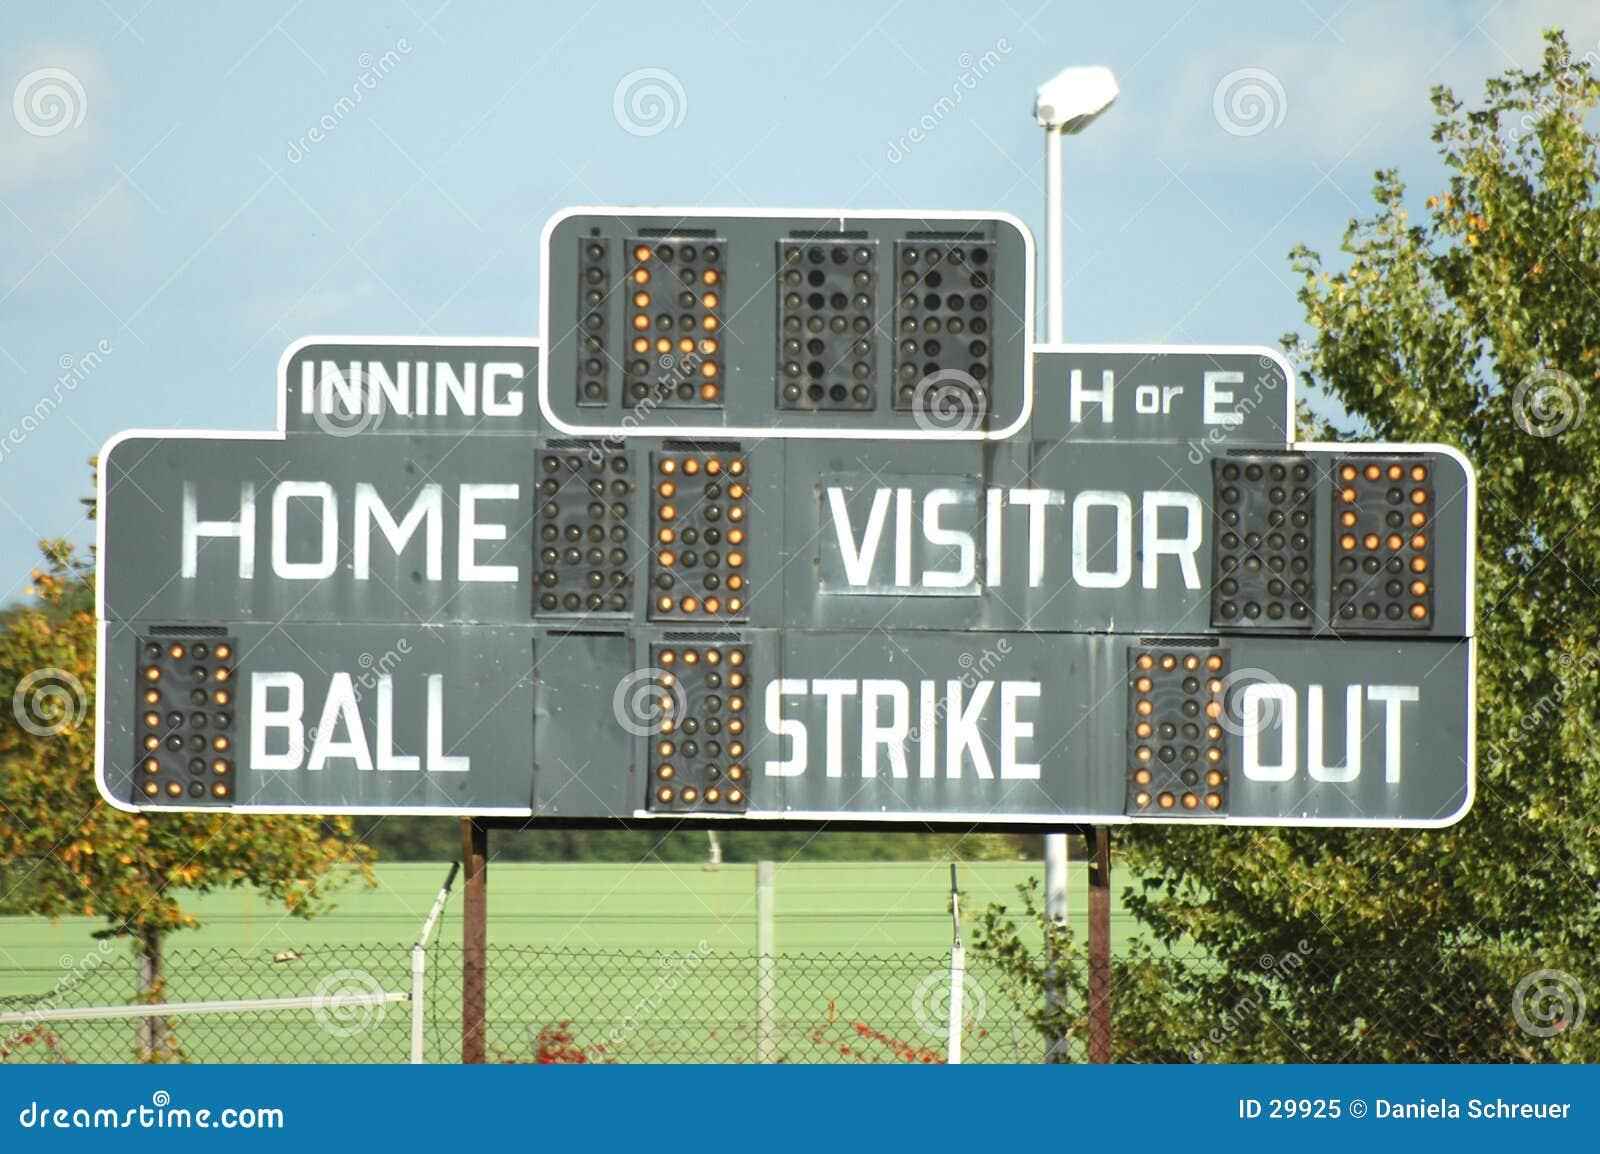 Whats the score?